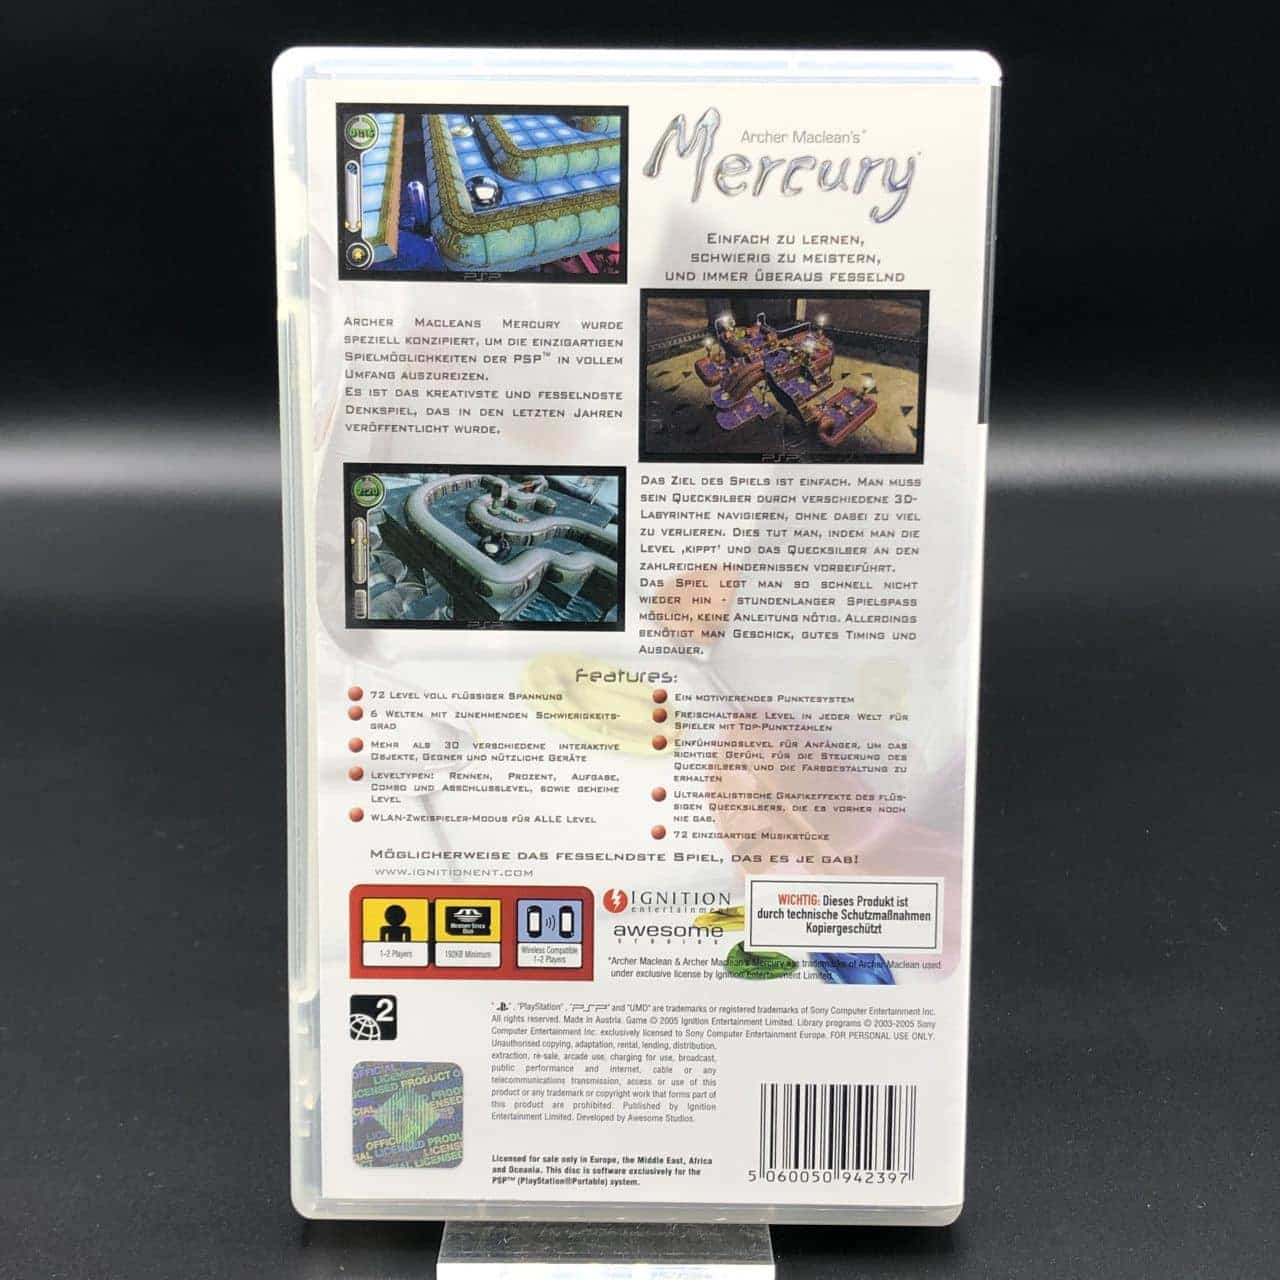 PSP Archer Macleans Mercury (Komplett) (Sehr gut) Sony PlayStation Portable